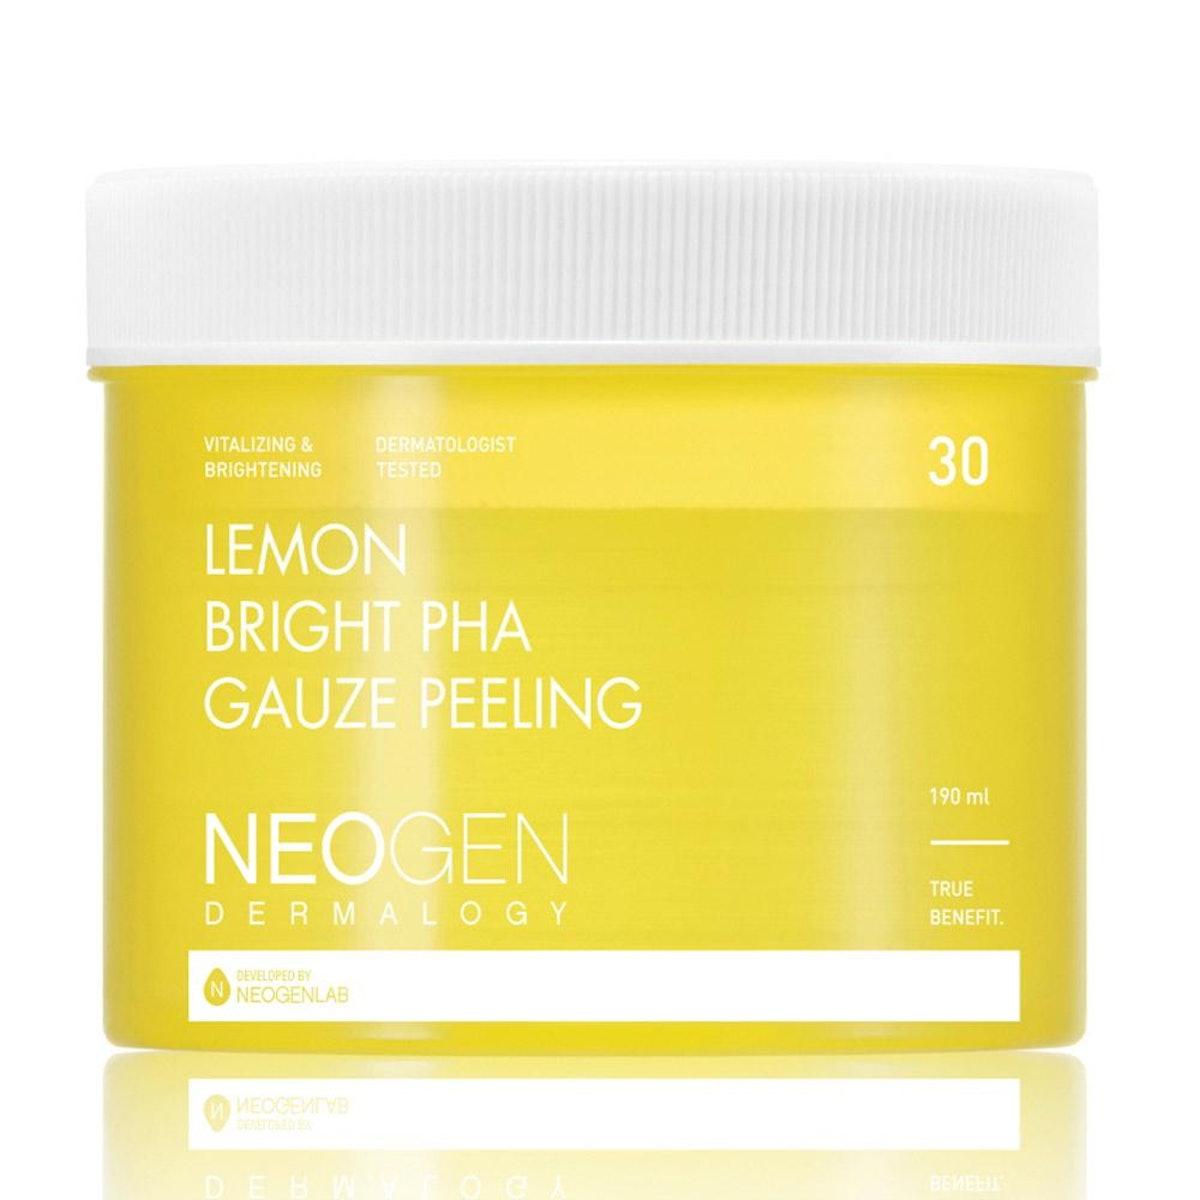 Lemon Bright PHA Gauze Peeling Pads